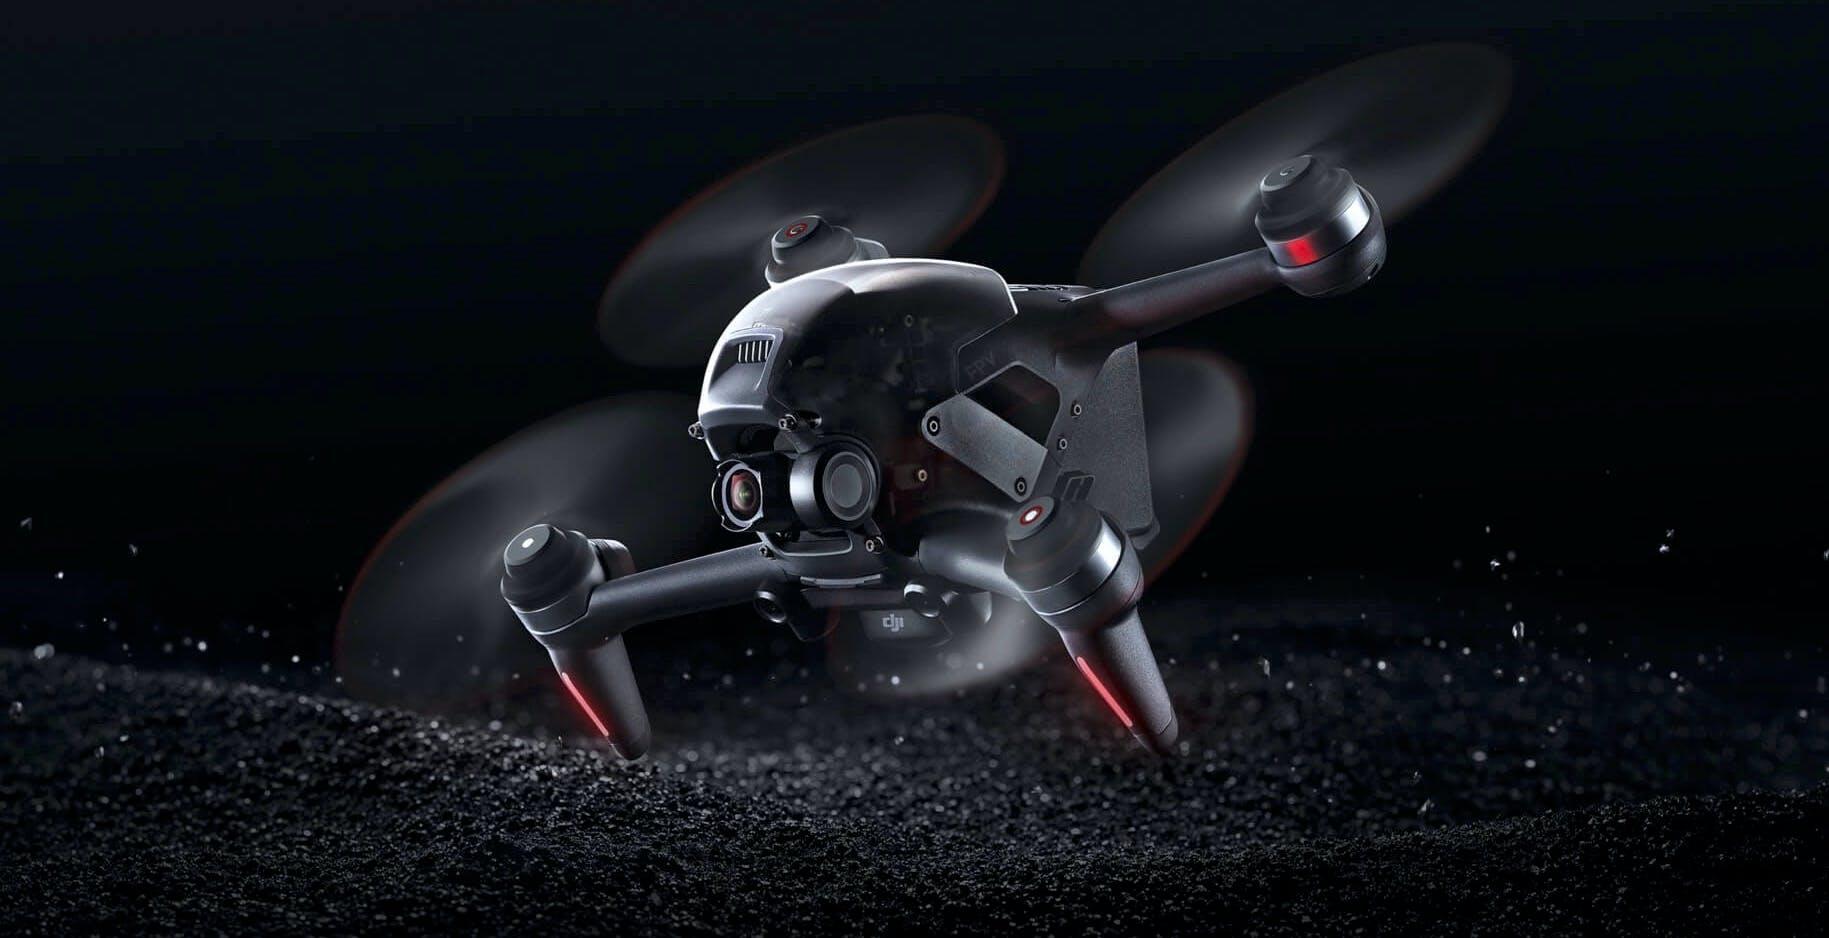 DJI FPV non è un normale drone, è adrenalina pura: riprese 4K a 140 km/h